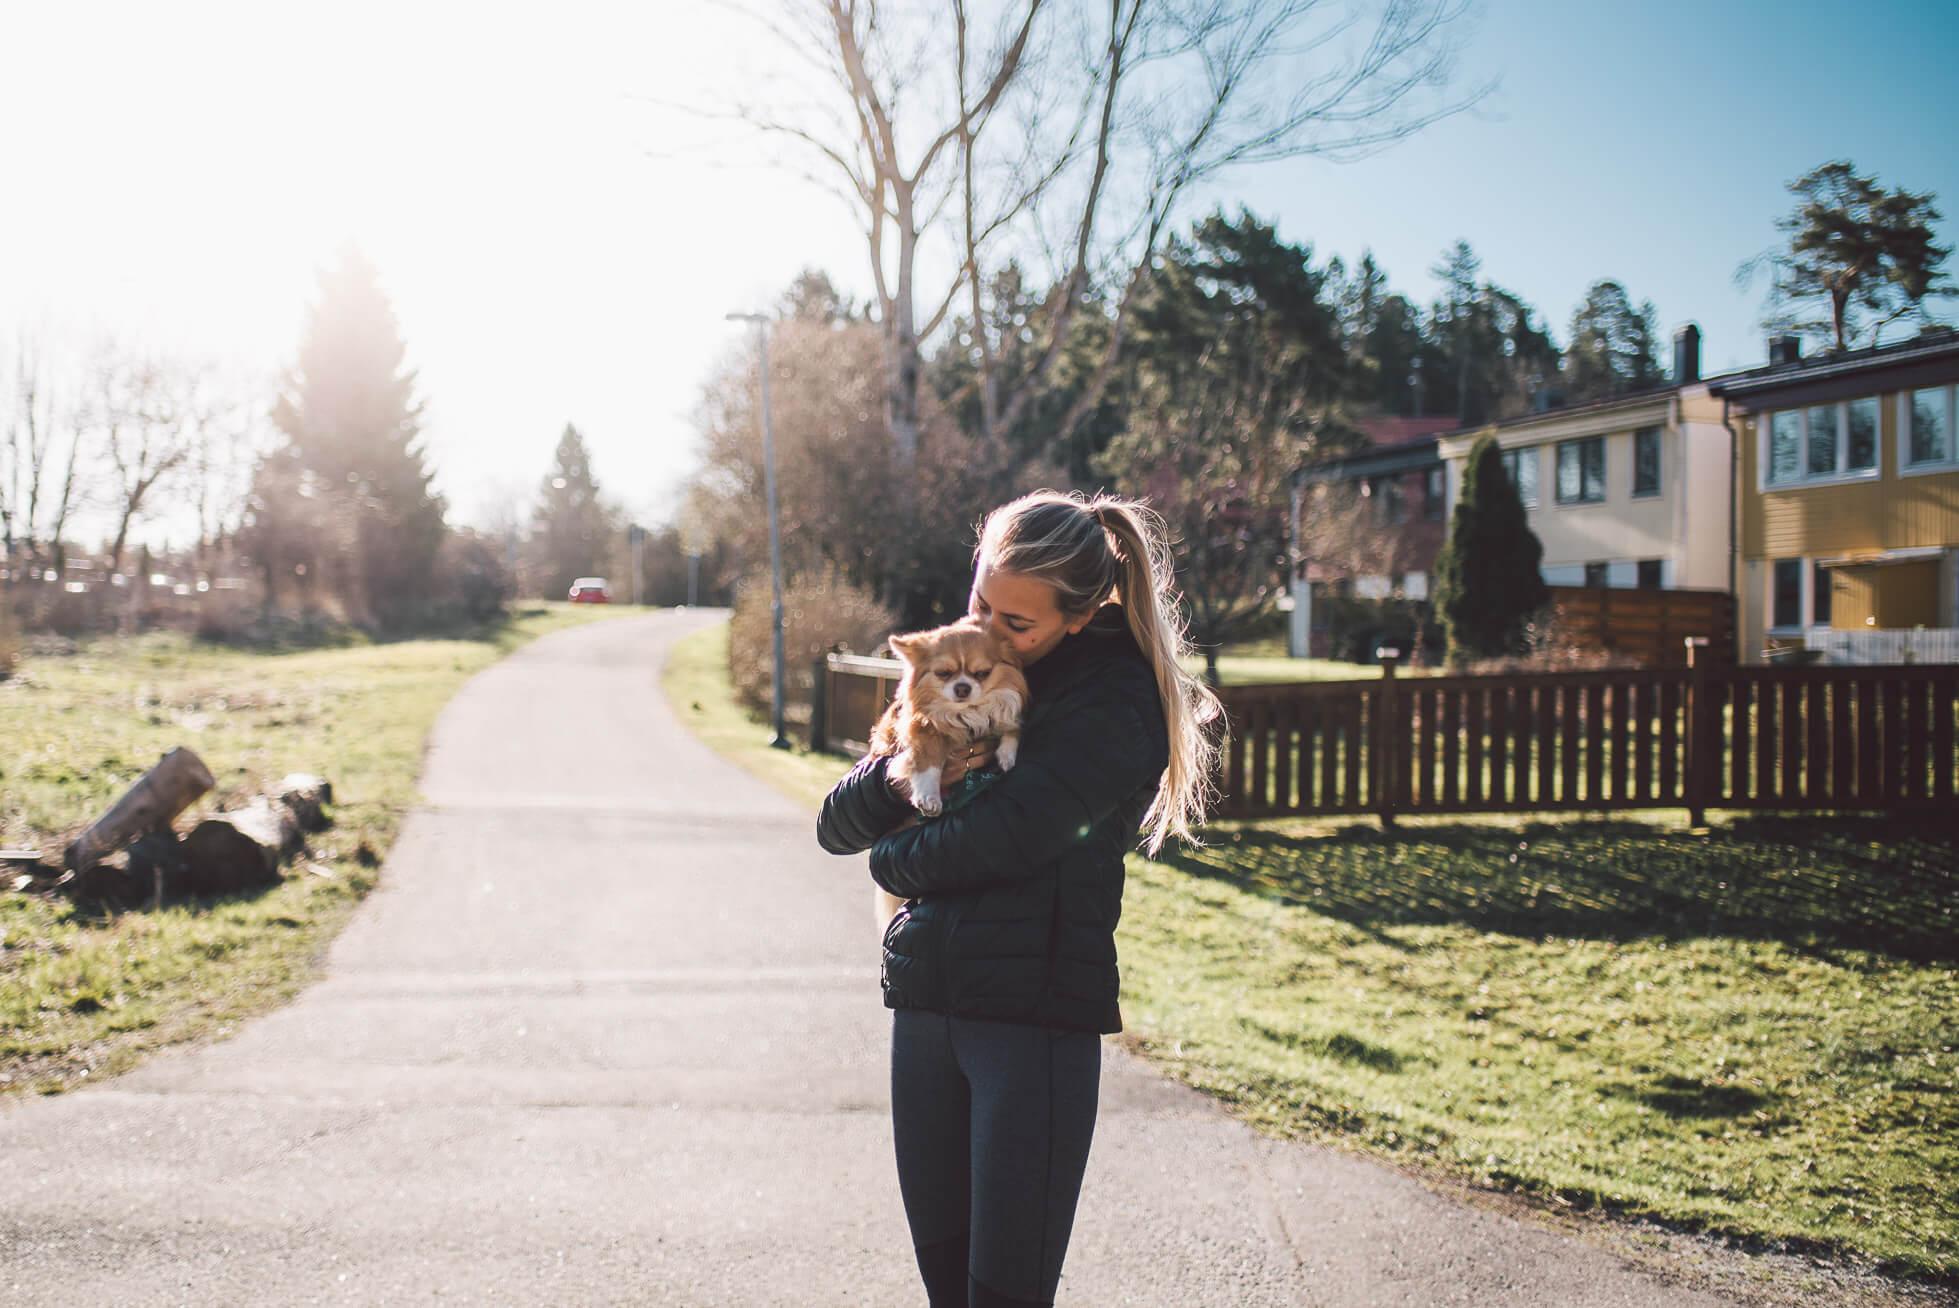 janni-deler-morning-walkDSC_3649